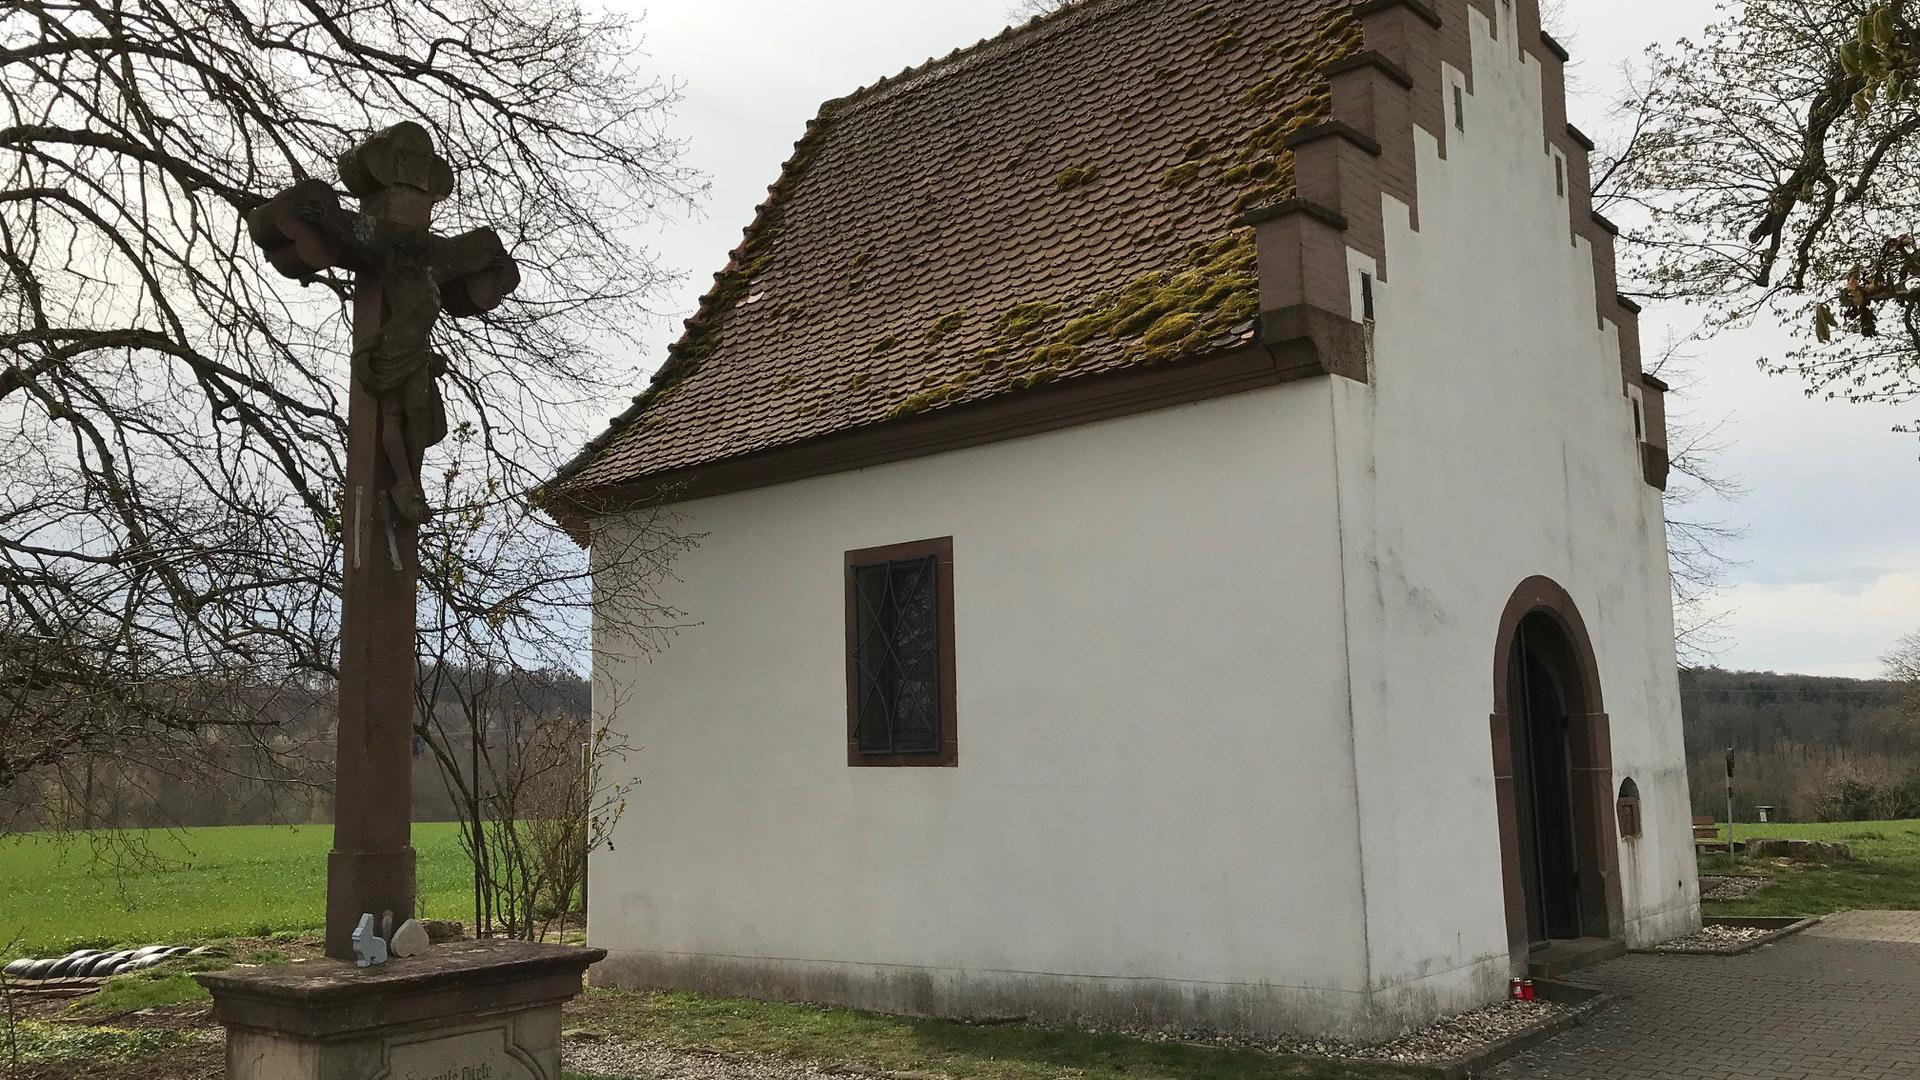 Maria-Hilf-Kapelle Walzbachtal Jöhlingen